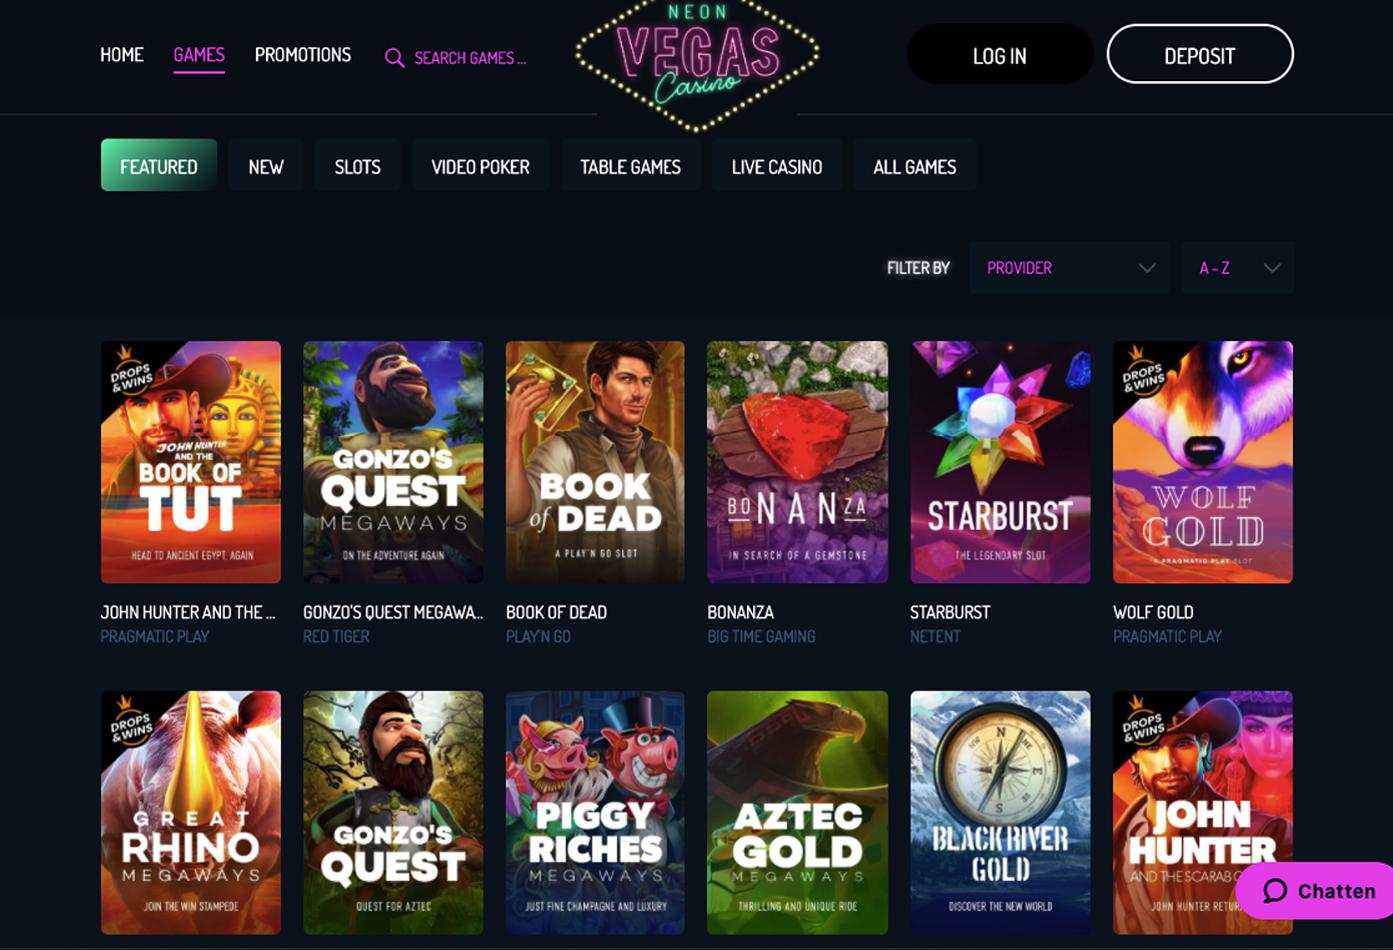 Free pokies online dolphin treasure to play